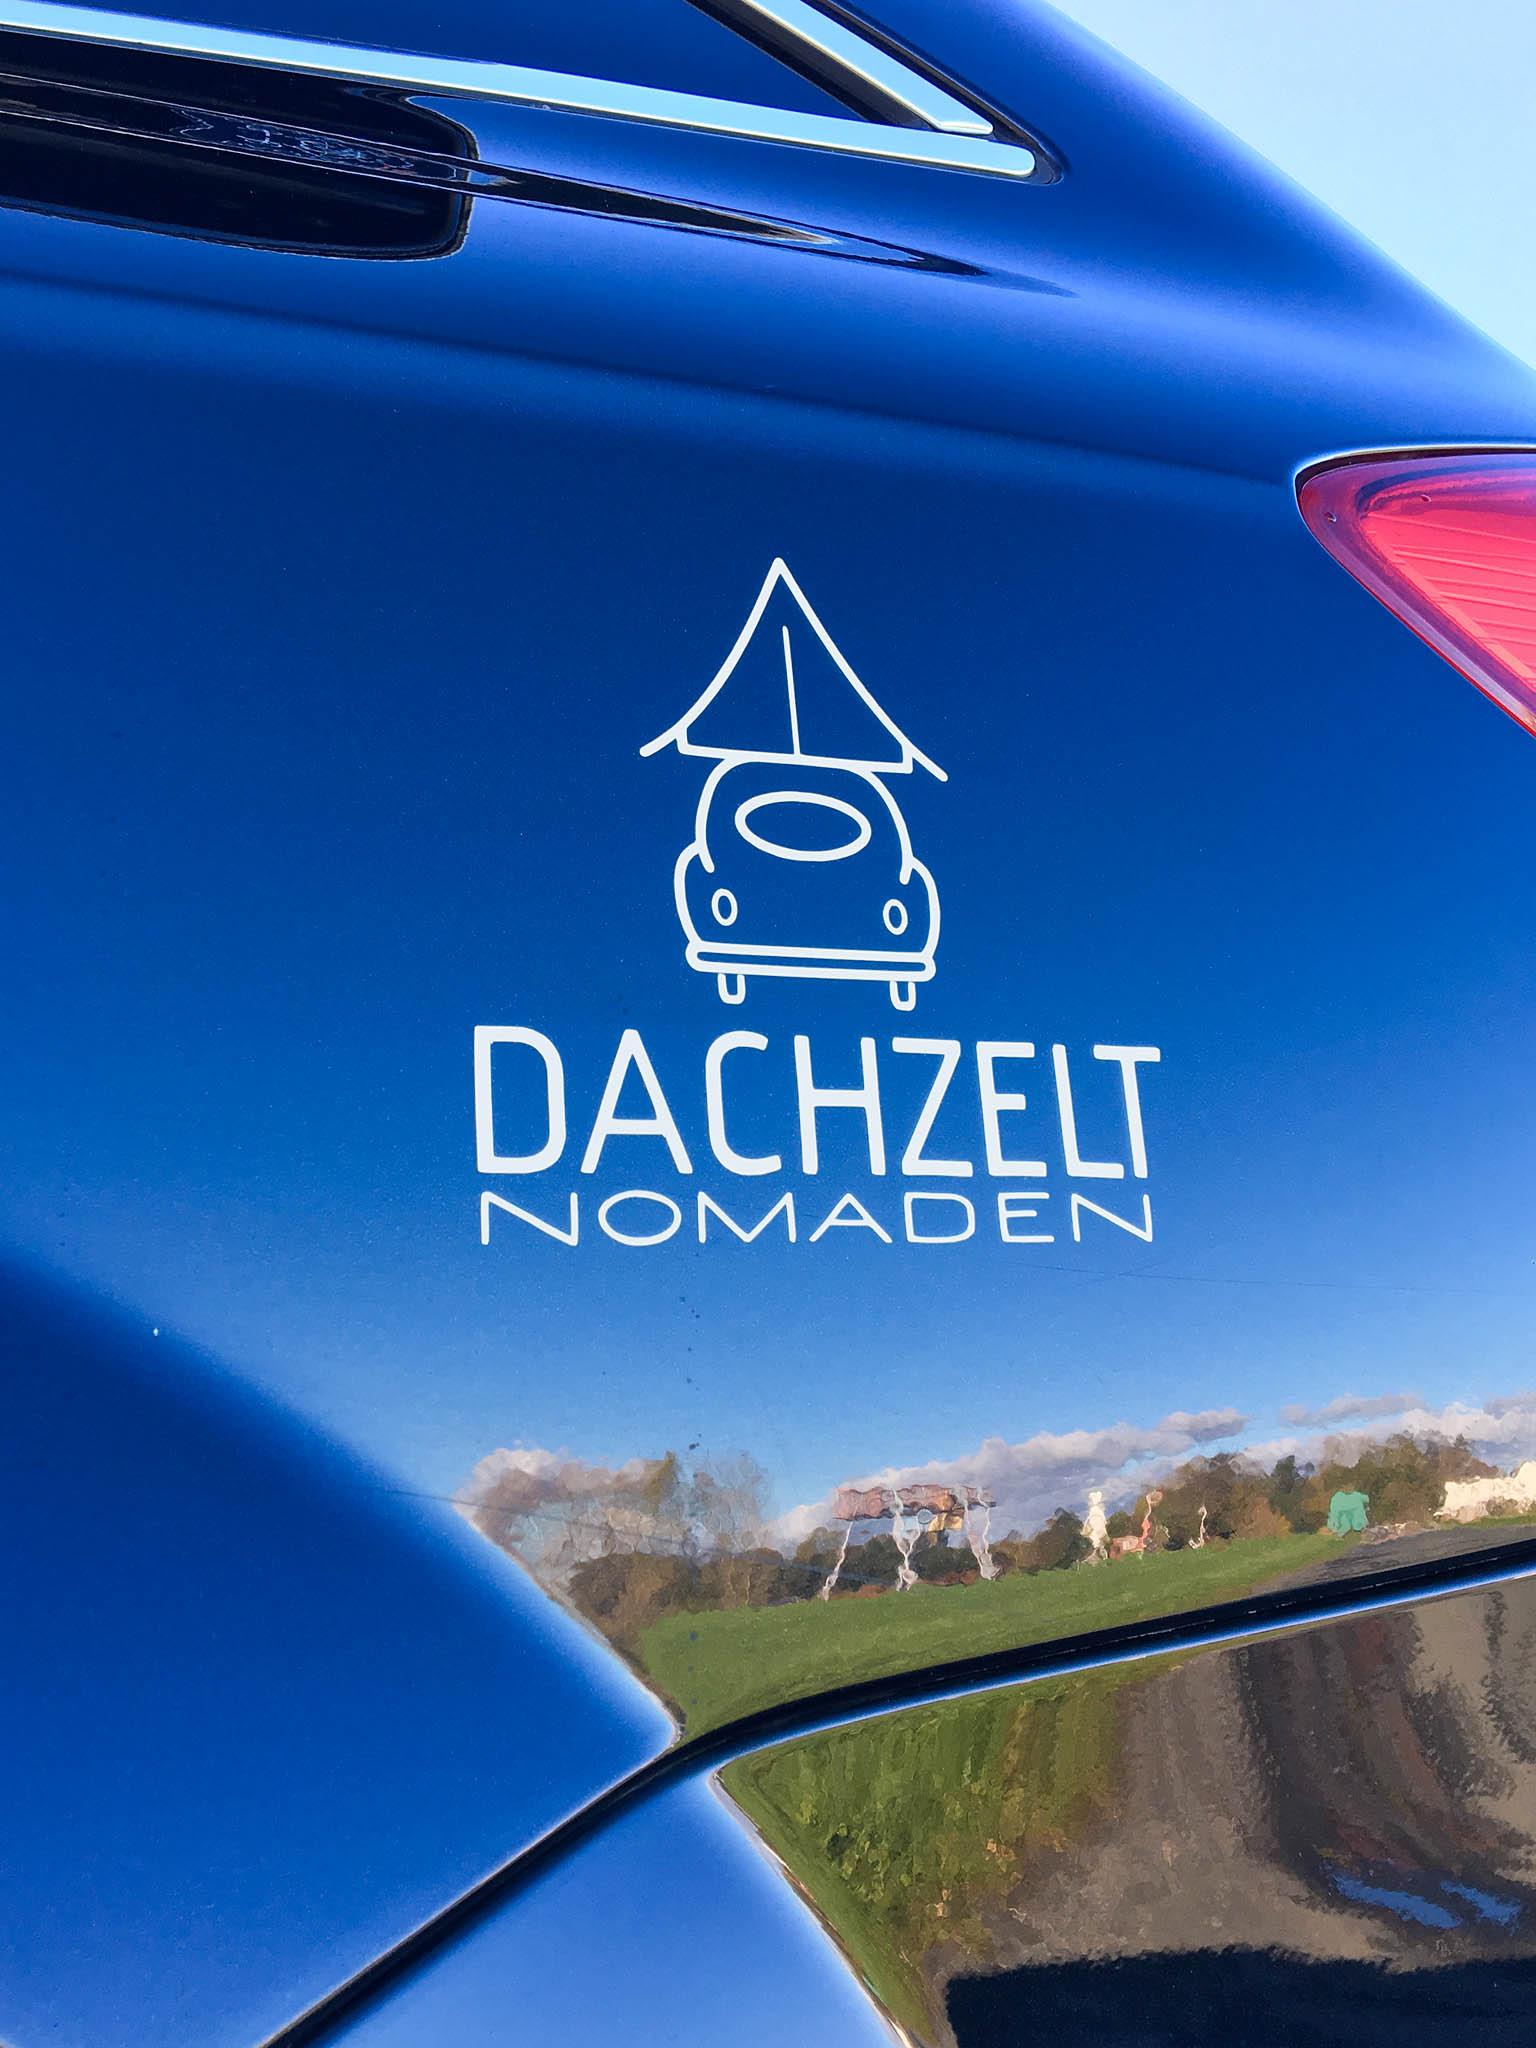 20181027_1430_IMG_1316-2_dachzeltnomaden-dachzelt-label-aufkleber-sticker-logo.jpg